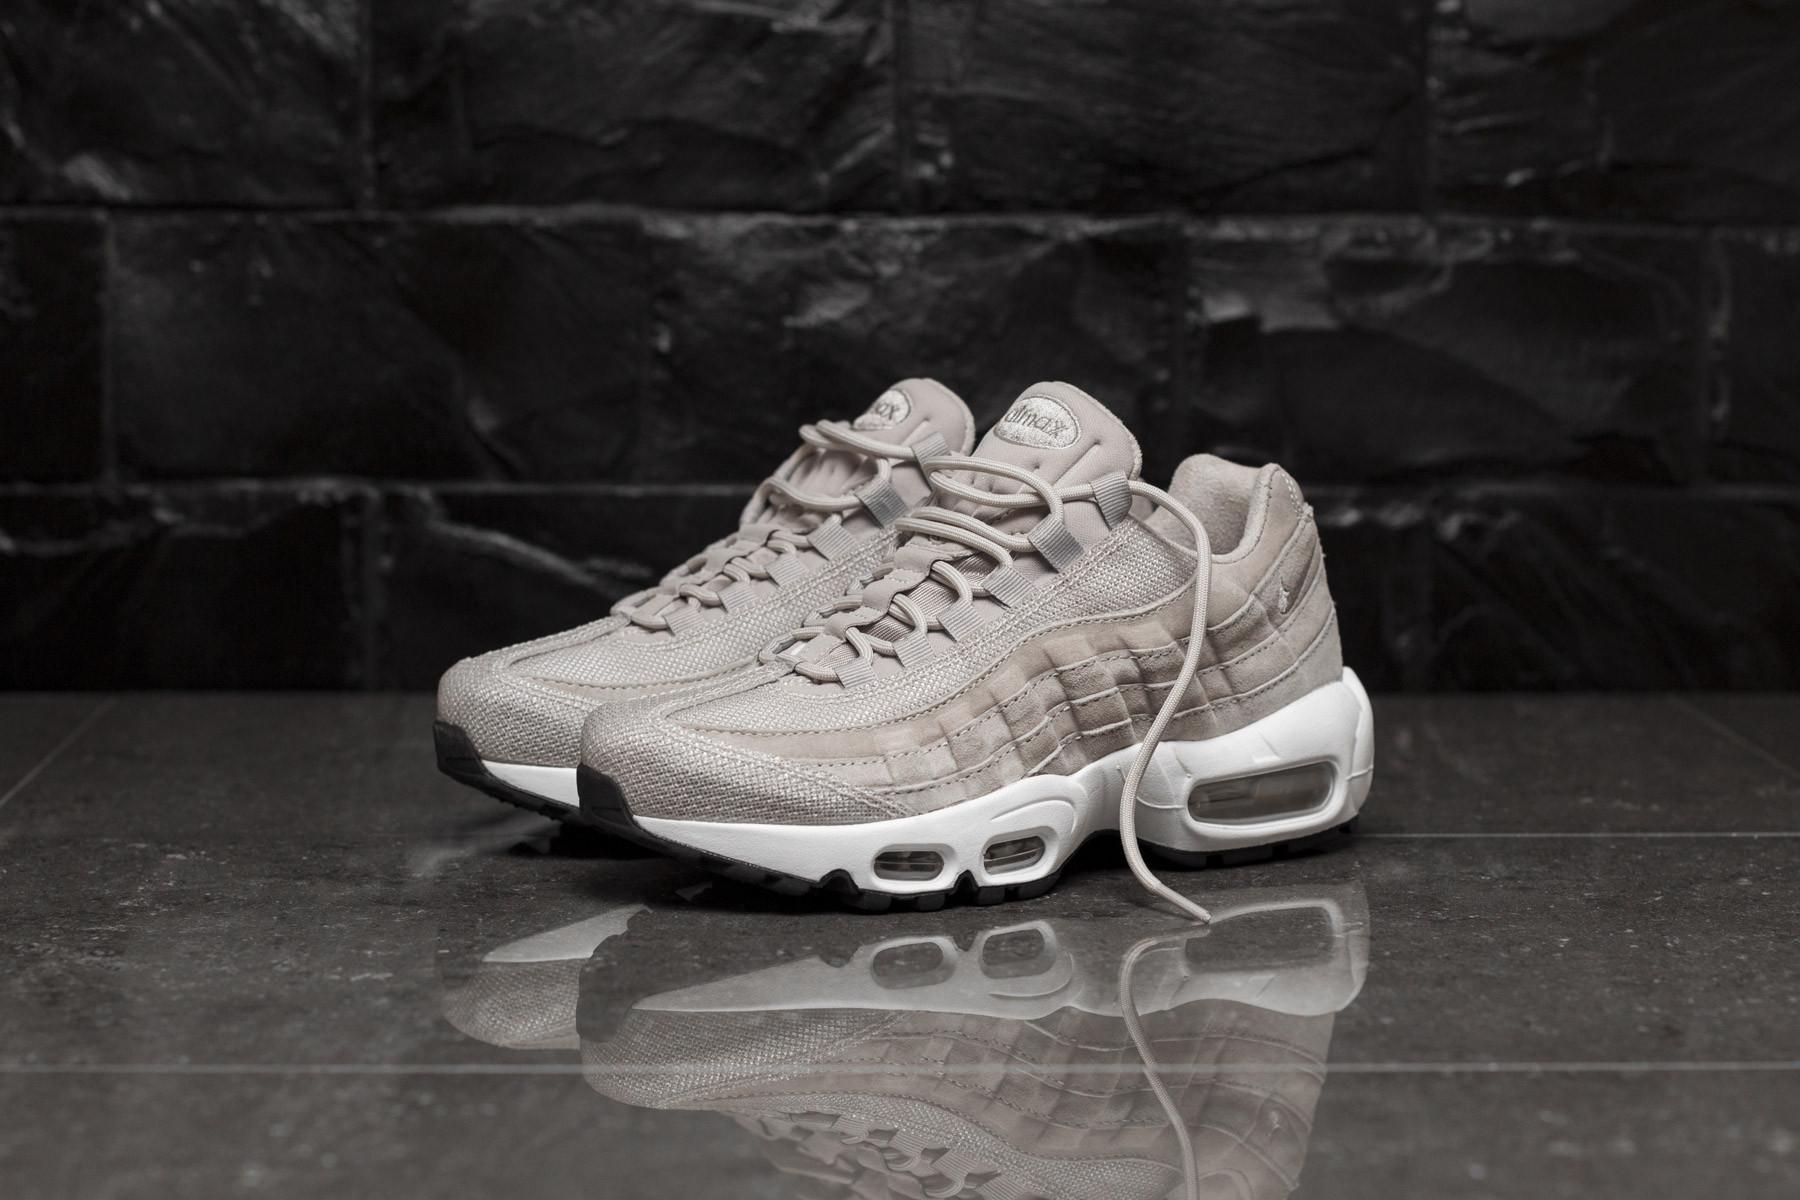 innovative design 98925 9a7a1 W Nike Air Max 95 PRM - Dame - Sneakers - Sneaker.no